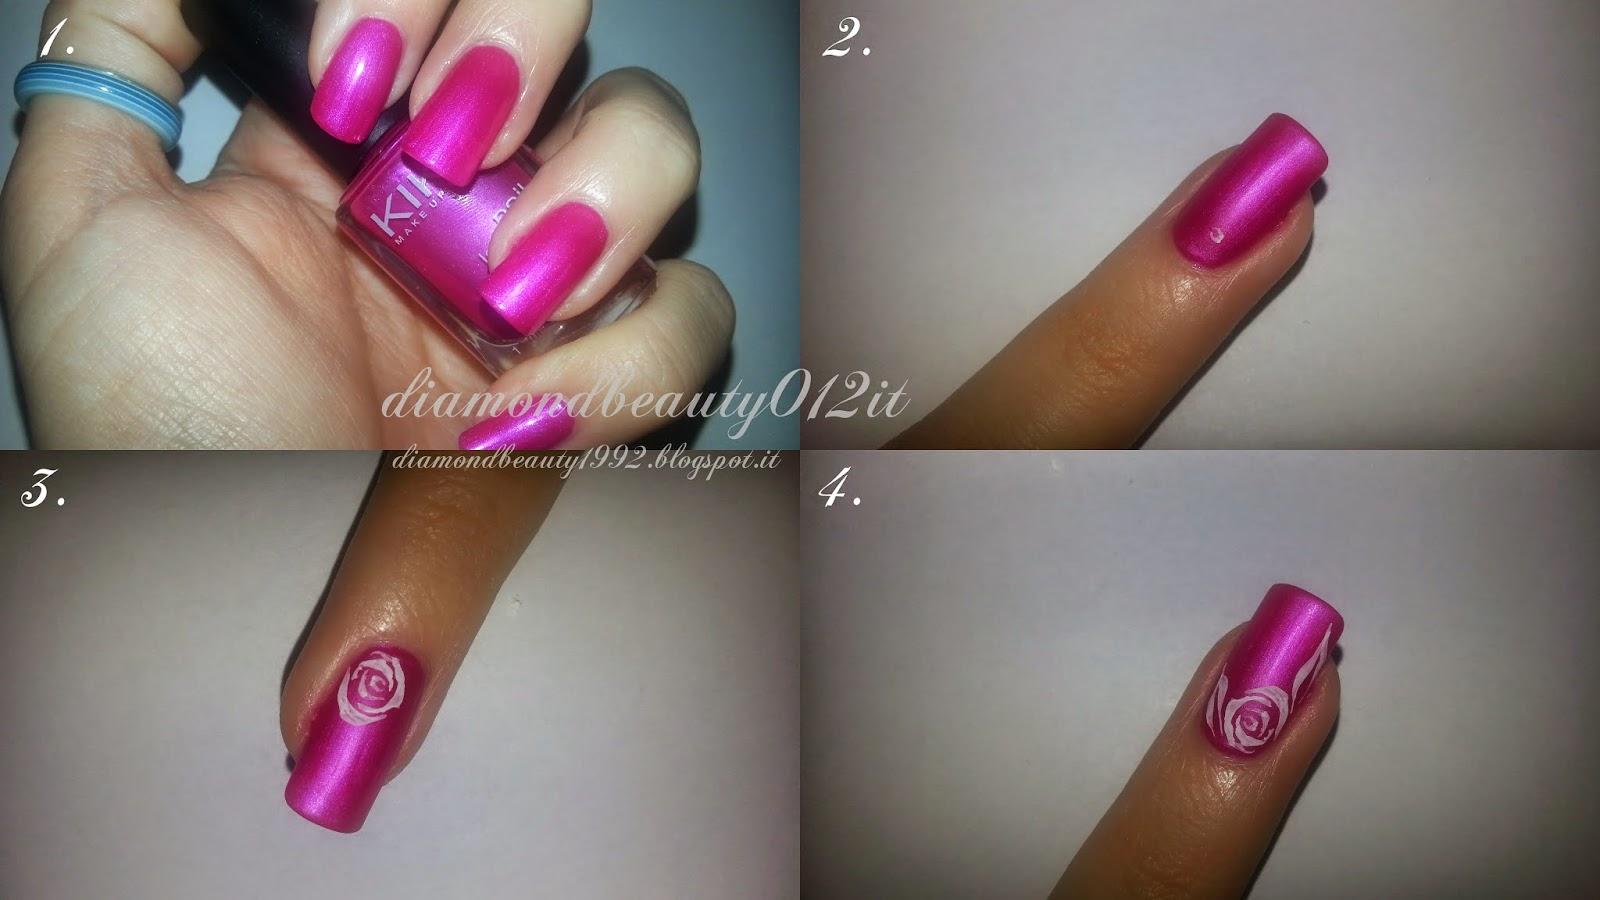 ricostruzione unghie nail art unghie naturali rosa stilizzata tutorial